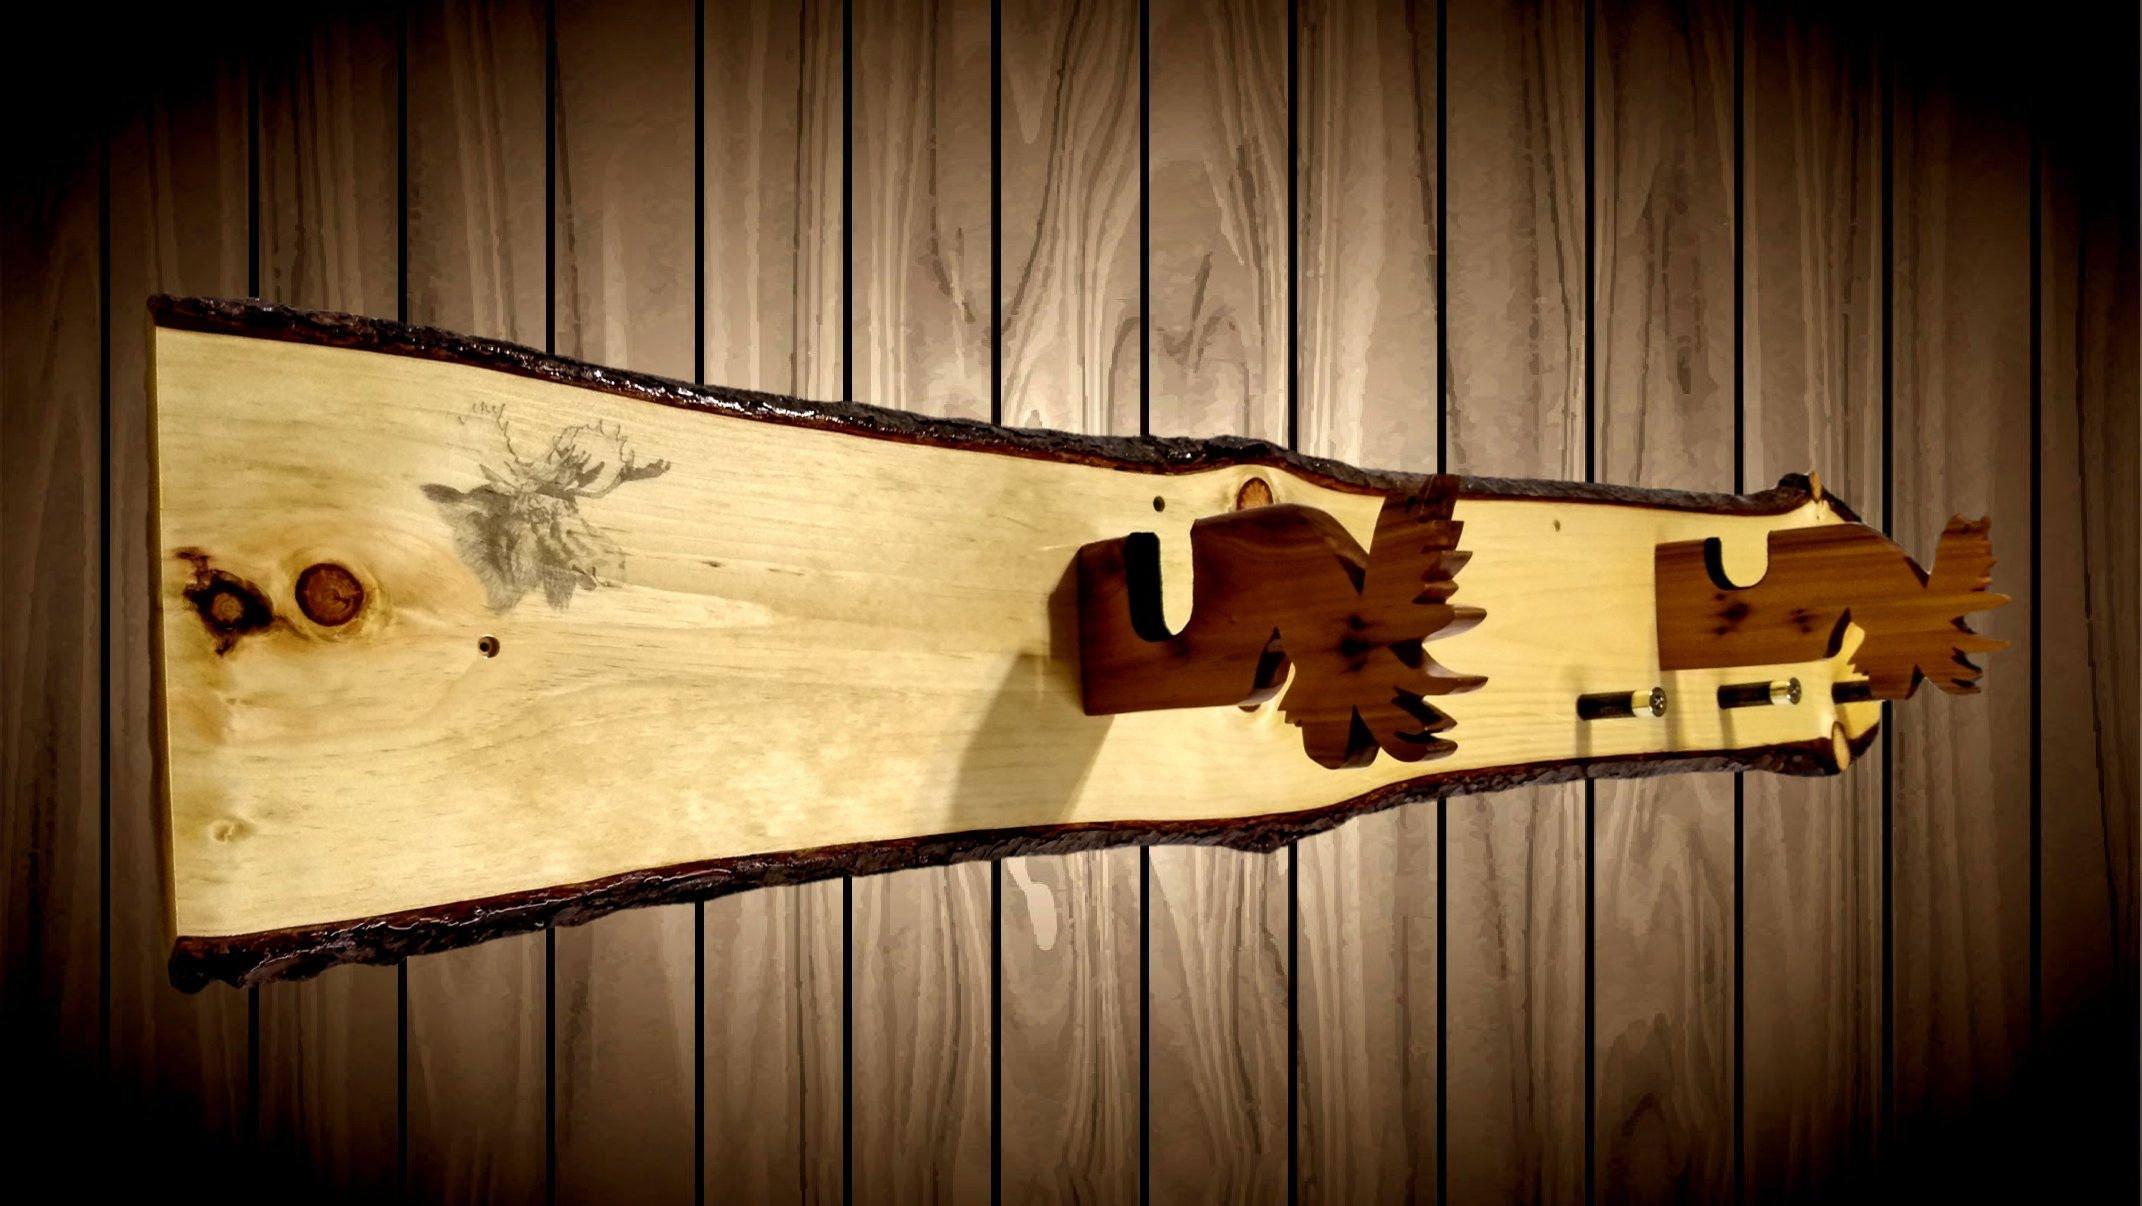 Rustic Knotty Pine Moose Gun Rack Cedar Hangers Shotgun Shell Pegs Rifle  Moose Print Rifle Shotgun Muzzle Loader Home Cabin Decor Gift